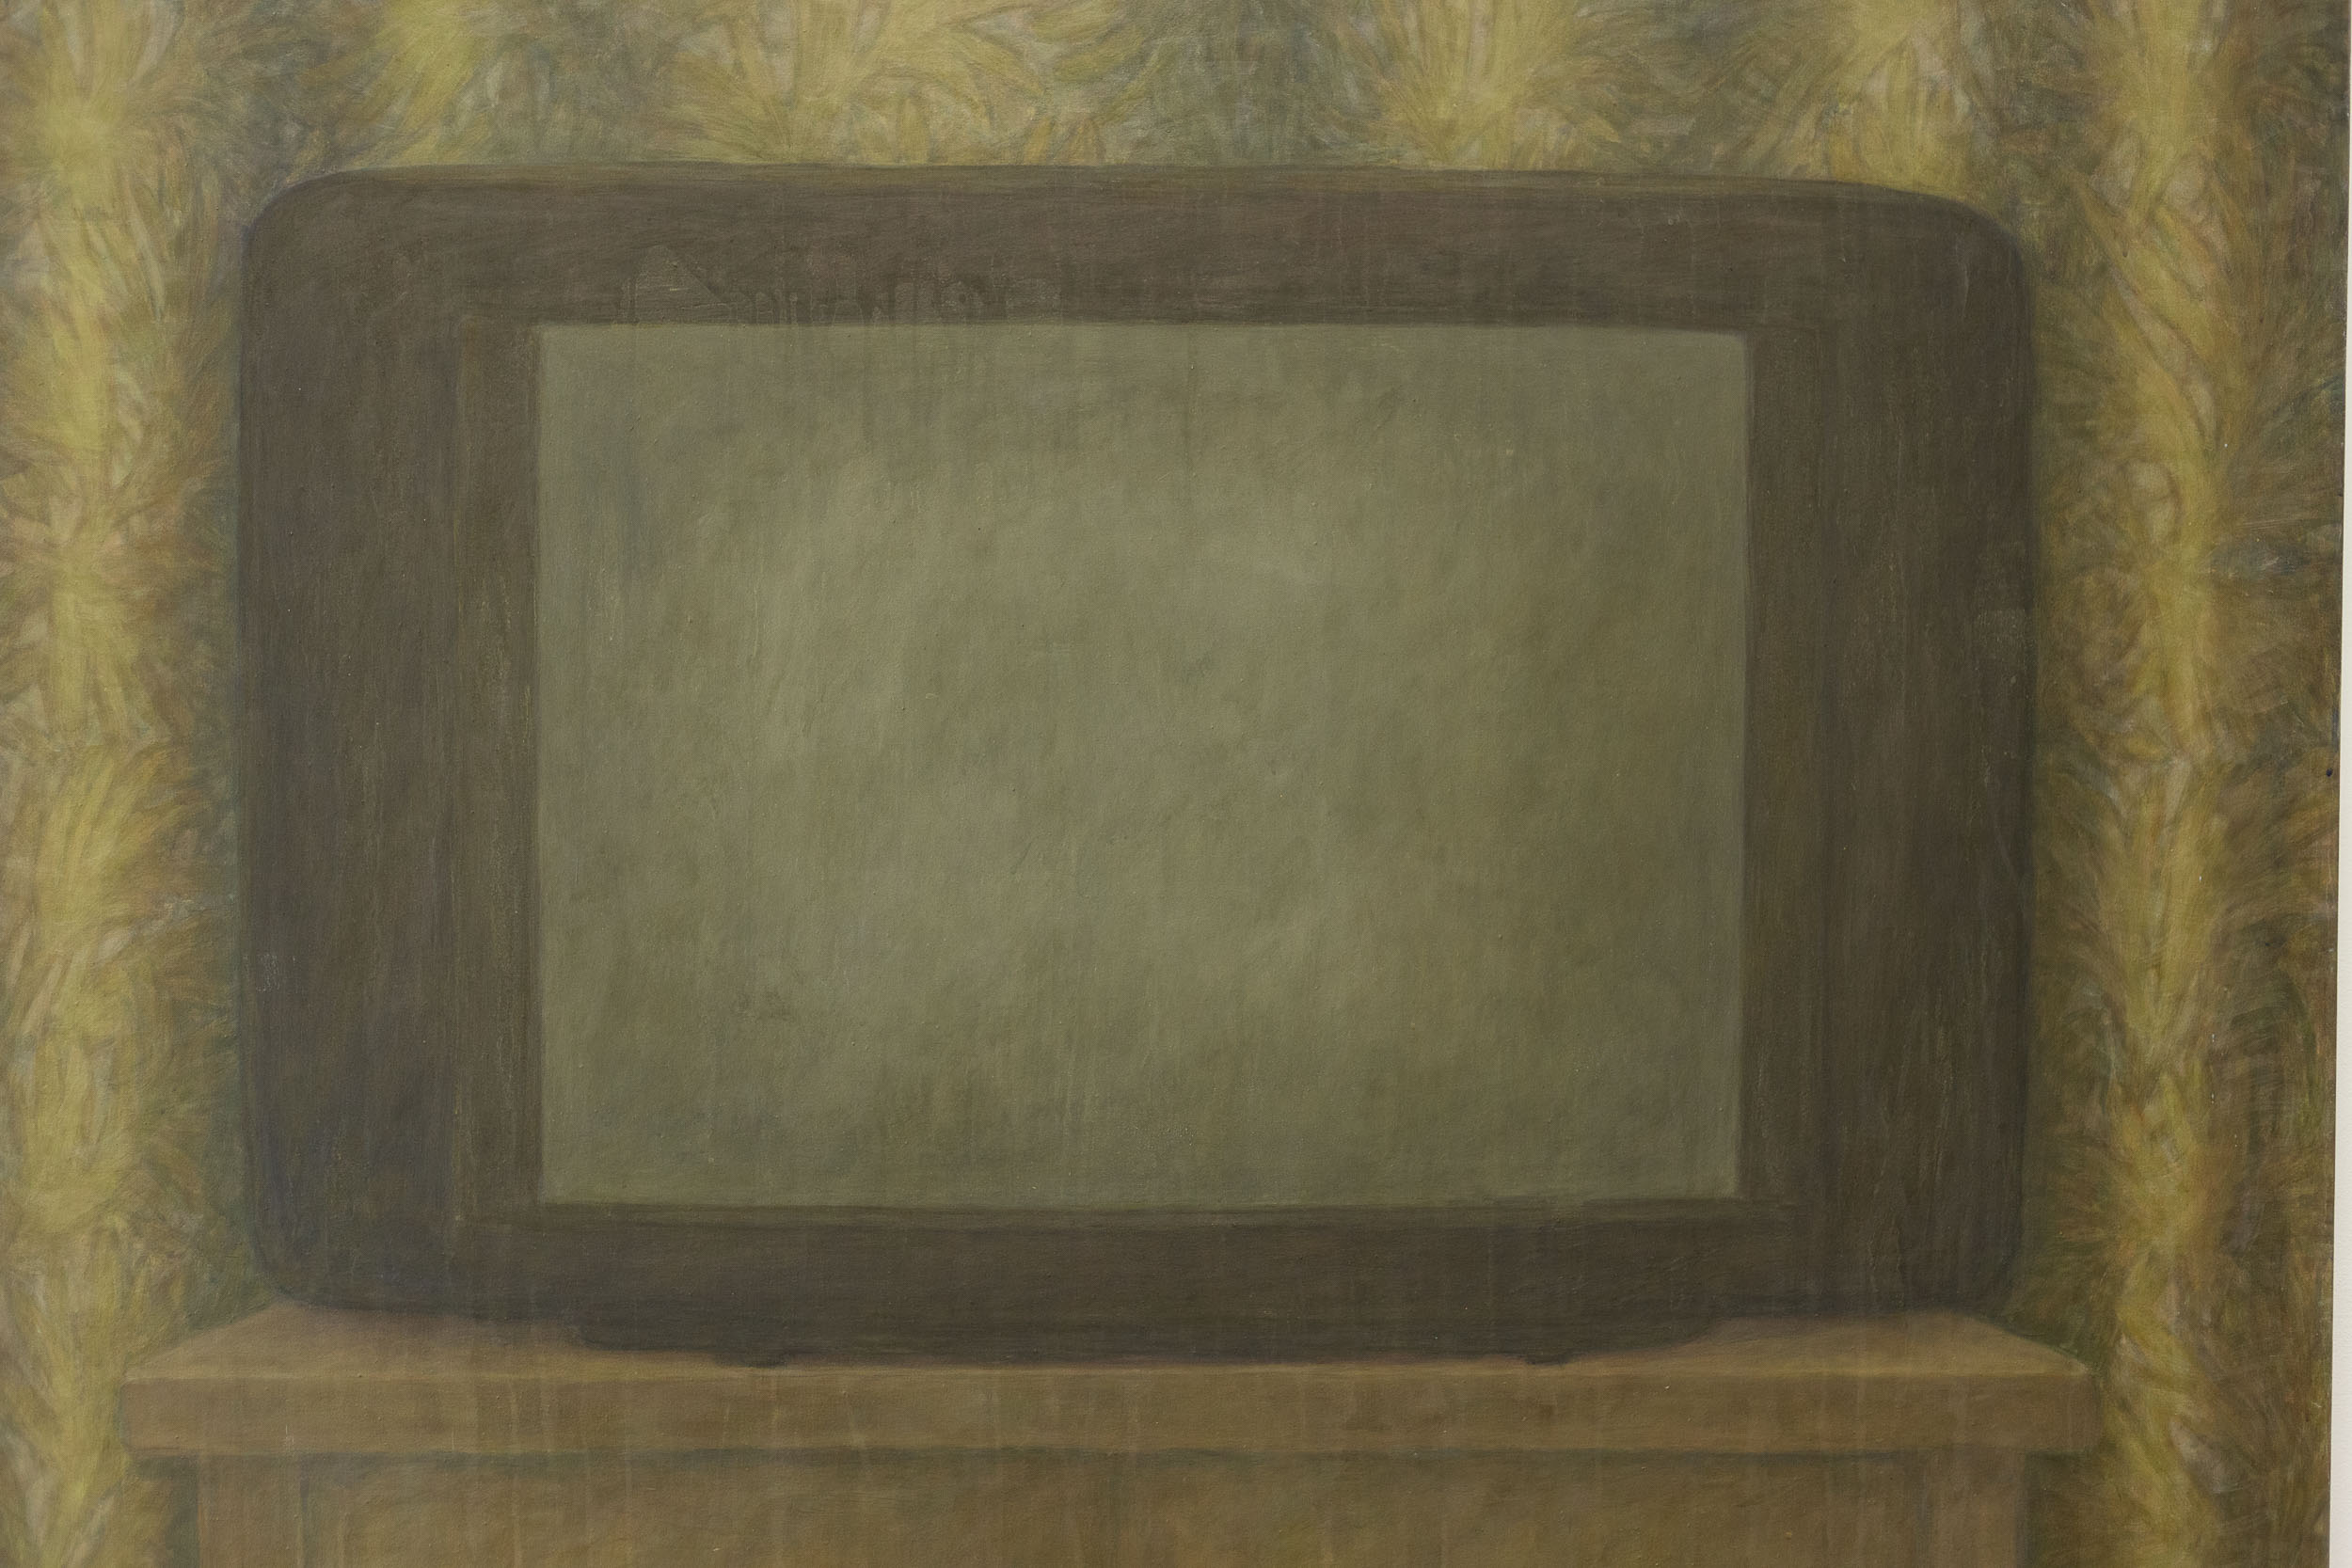 Christoph Hänsli,  Untitled  (detail), 1995, egg tempera and acrylic on canvas, 139 x 120 cm  Photo: Kilian Bannwart